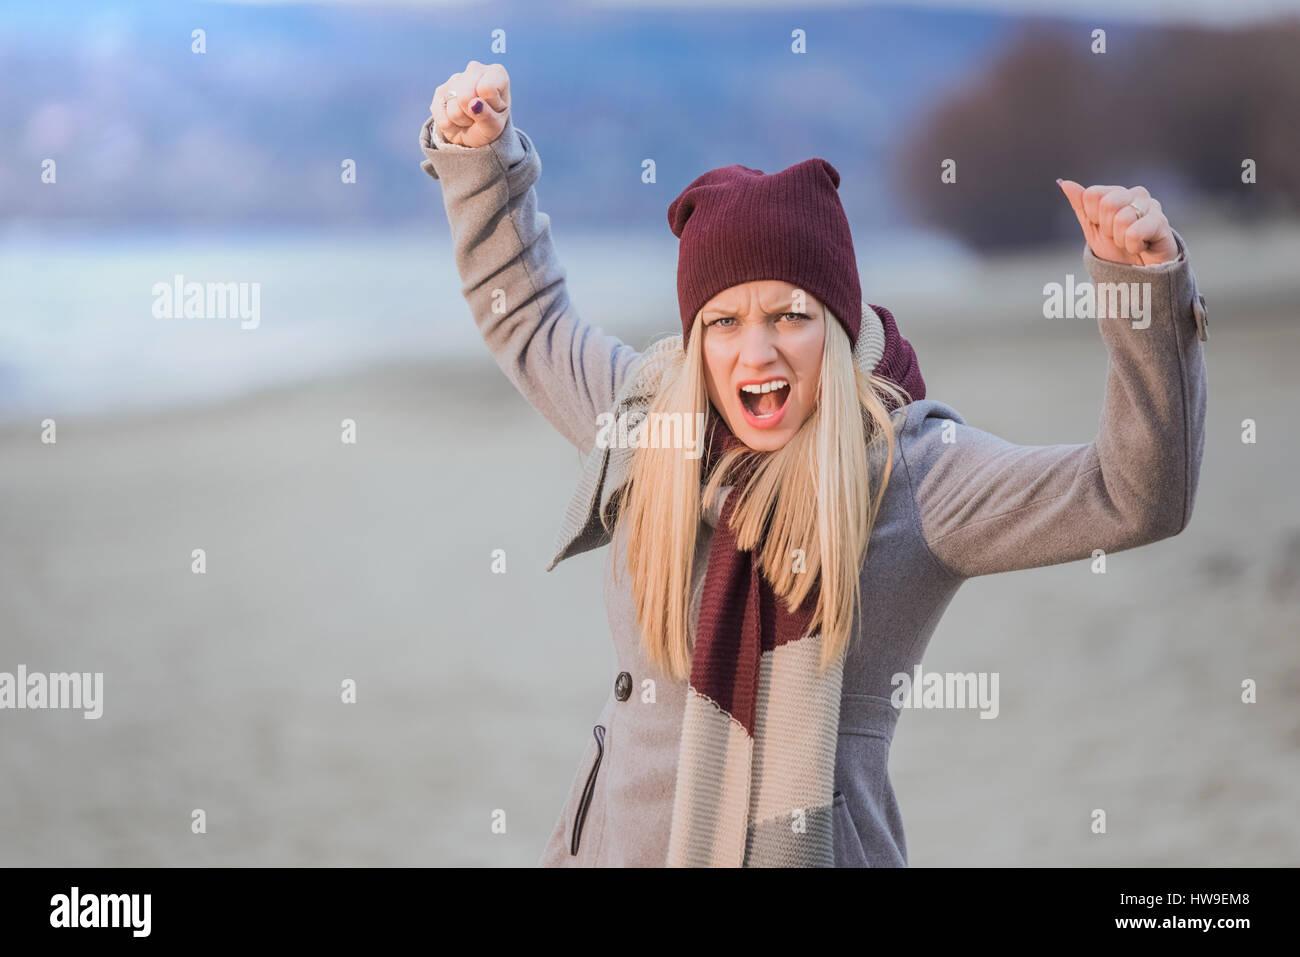 Joven chica furiosa protesta Imagen De Stock